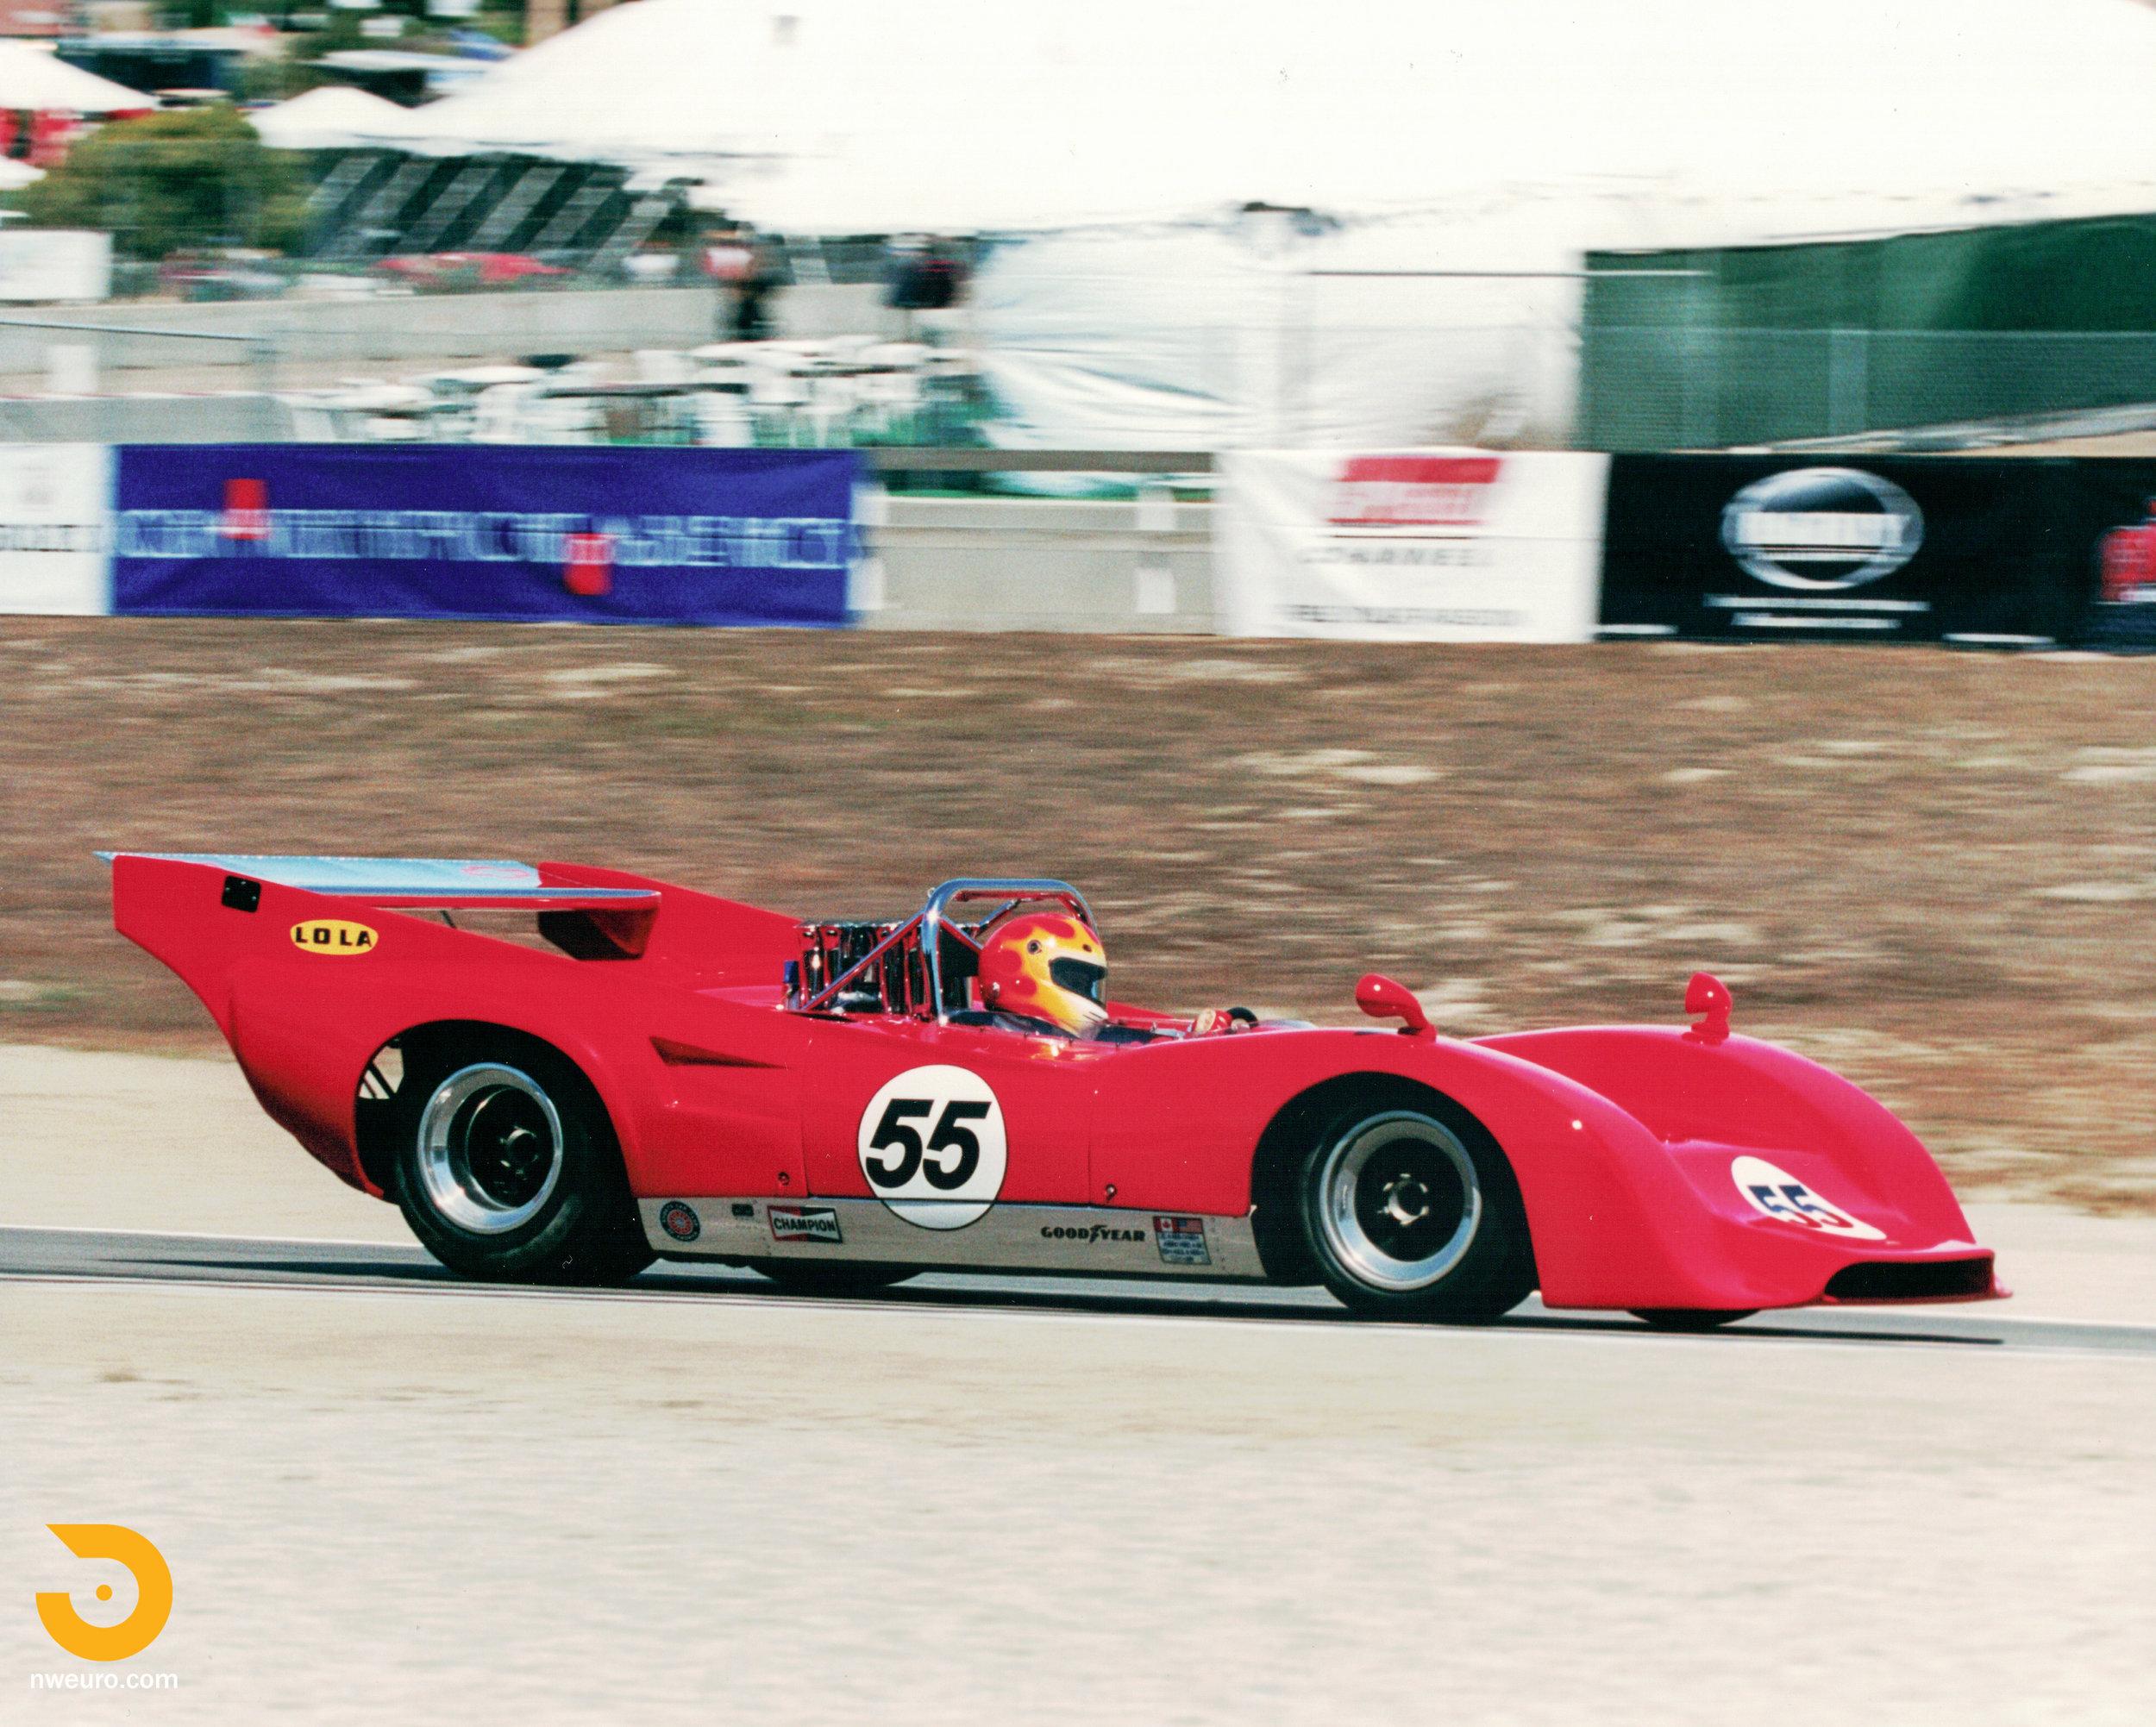 1969 Lola T162 Can-Am Race Car Action Shots-2.jpg